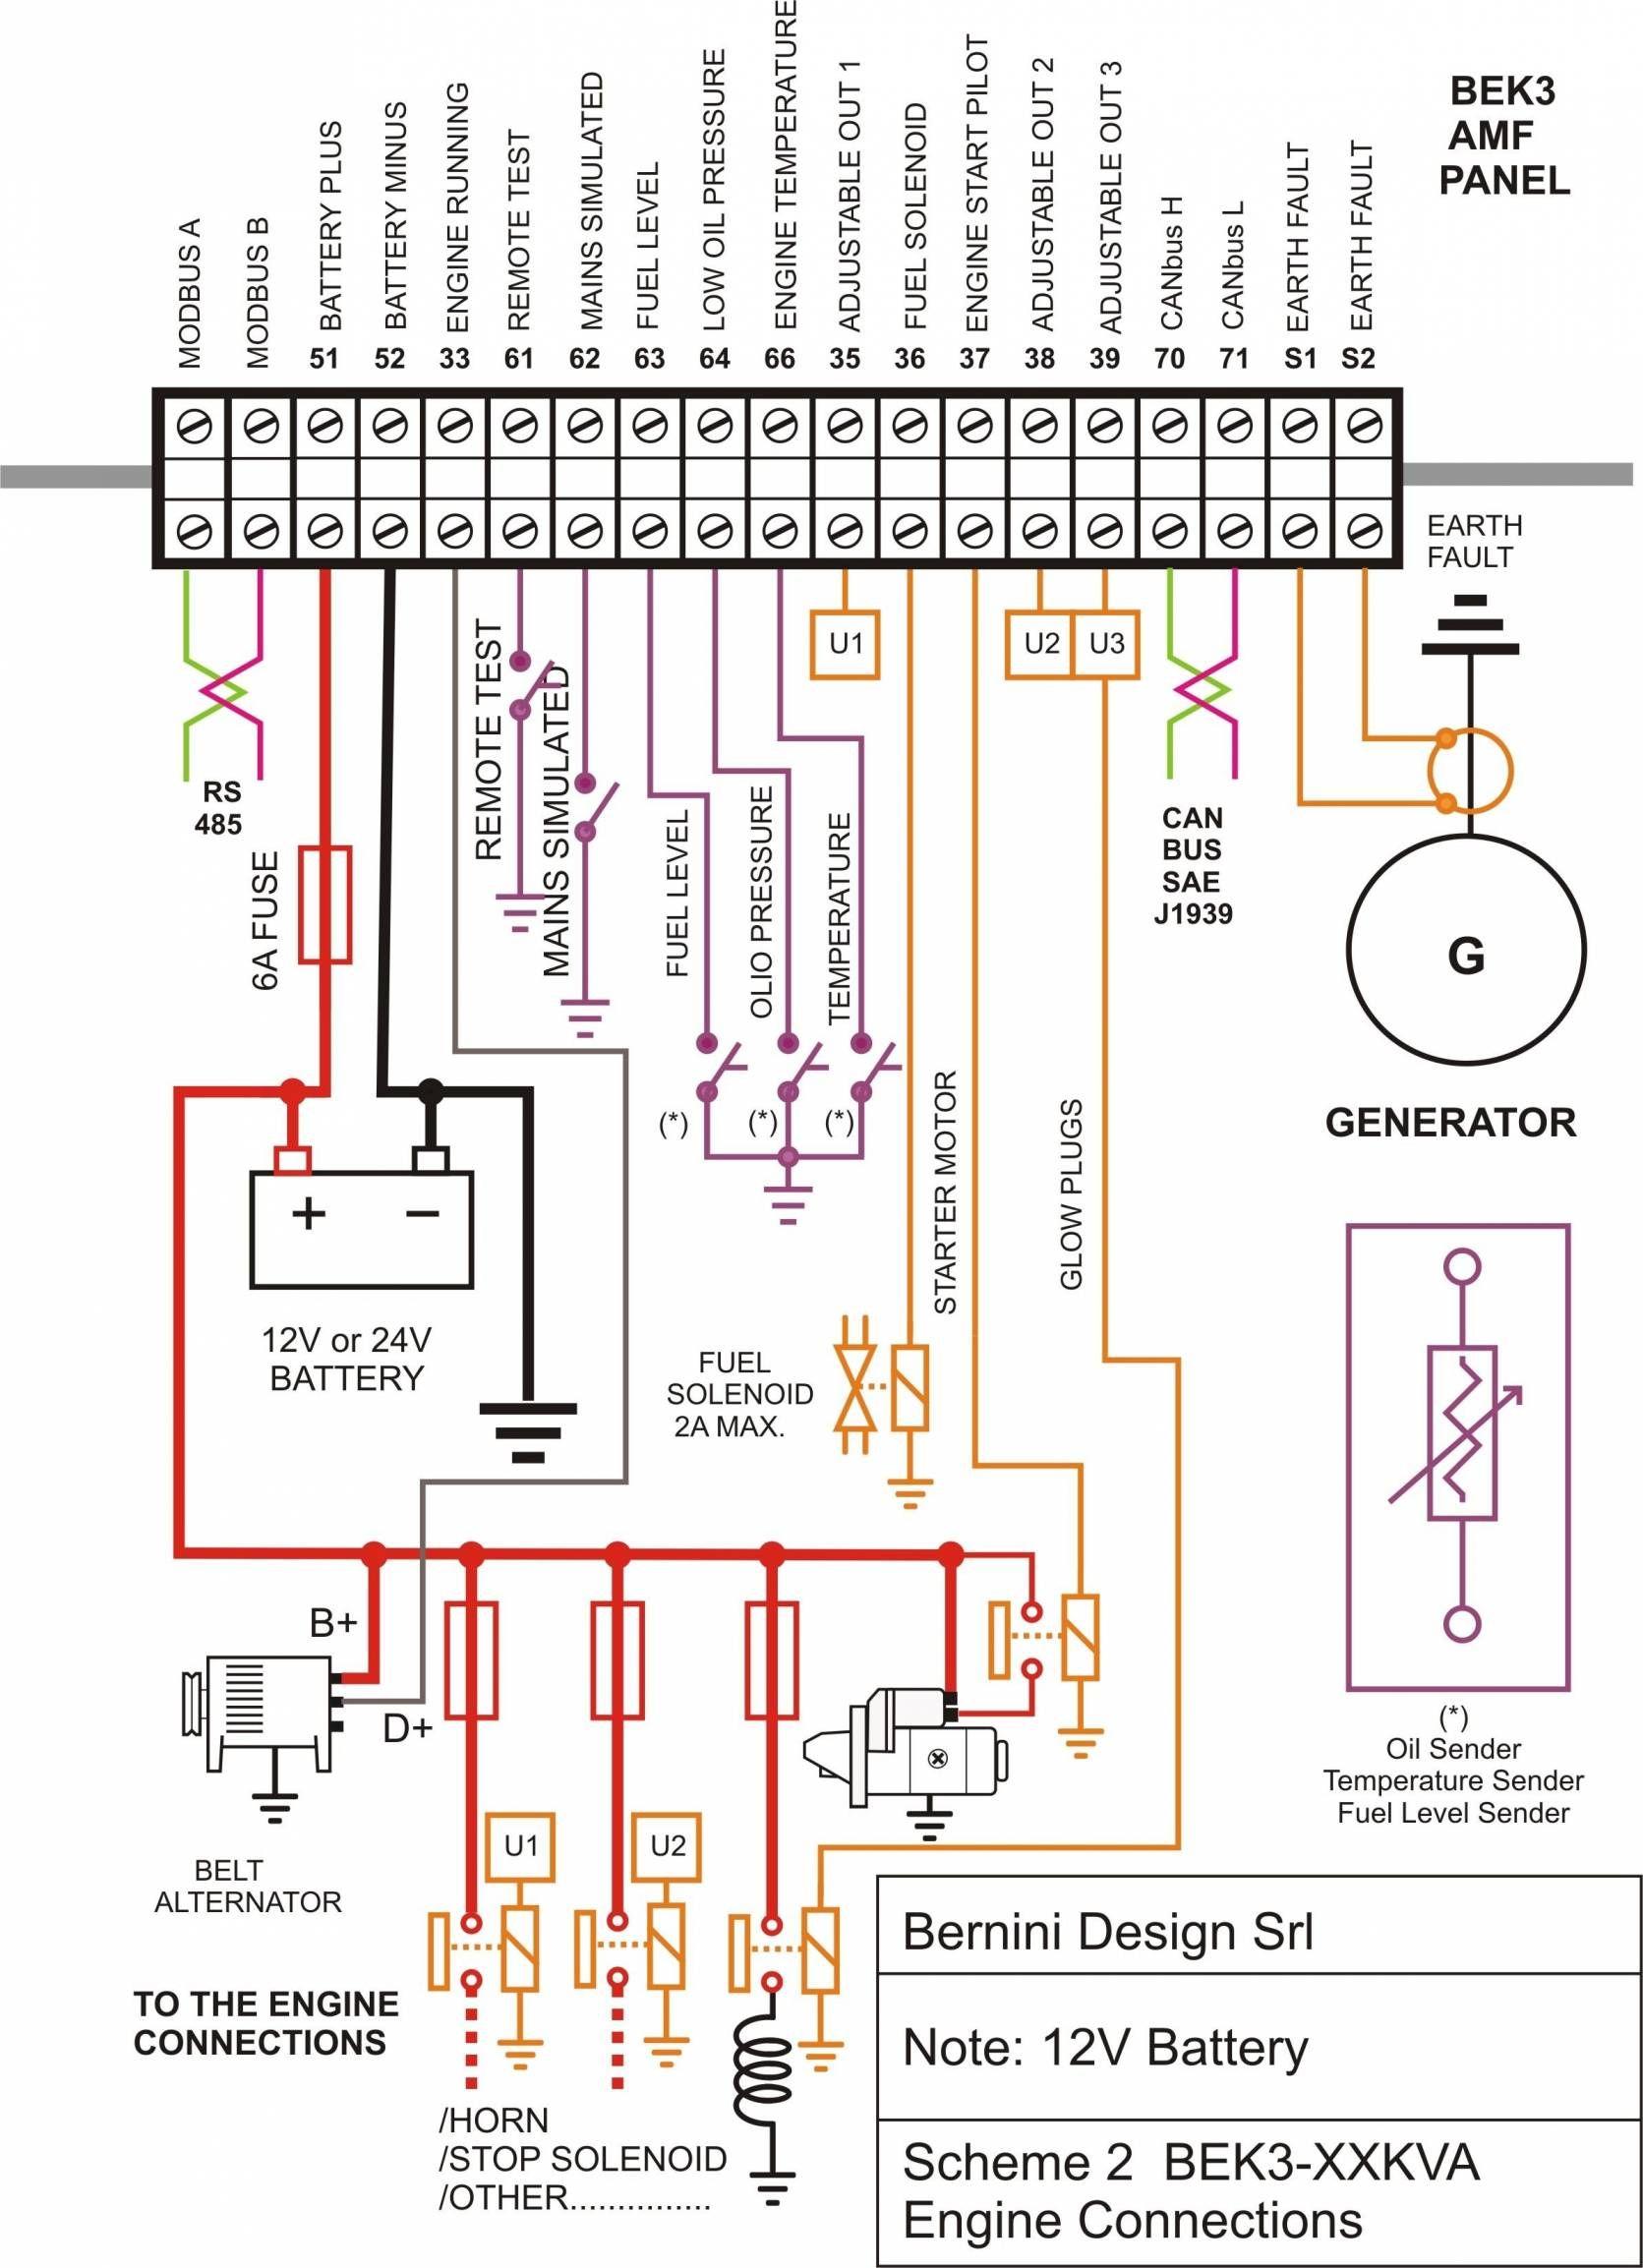 12 Ats Panel Wiring Diagram Electrical Circuit Diagram Electrical Wiring Diagram Circuit Diagram